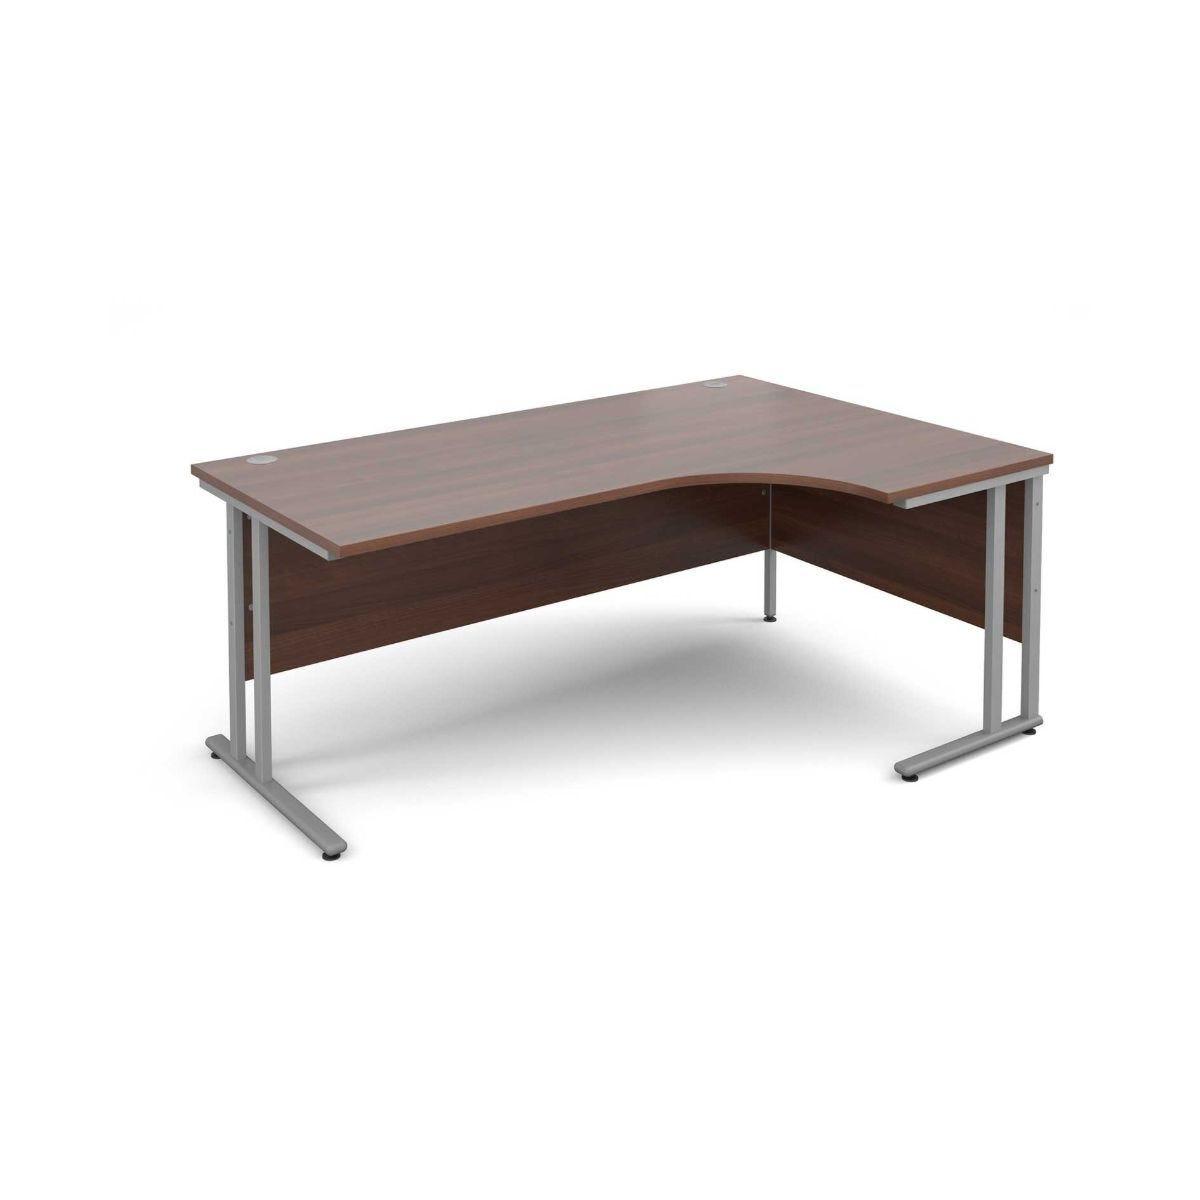 Maestro 25 Right Hand Ergonomic 1800 Desk with Silver Legs  Walnut